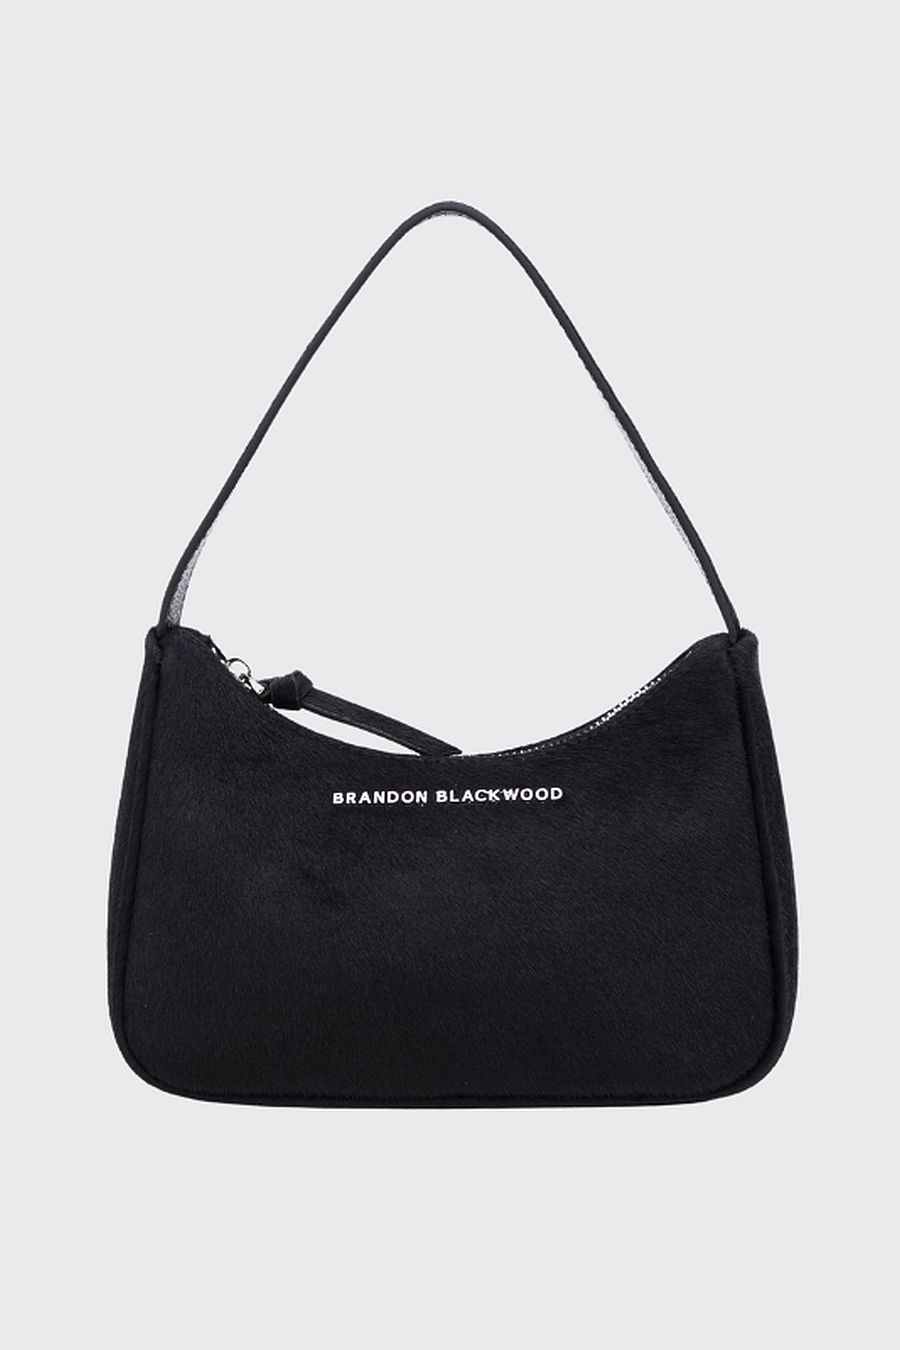 Brandon Blackwood SYL Bag- Black Ponyhair